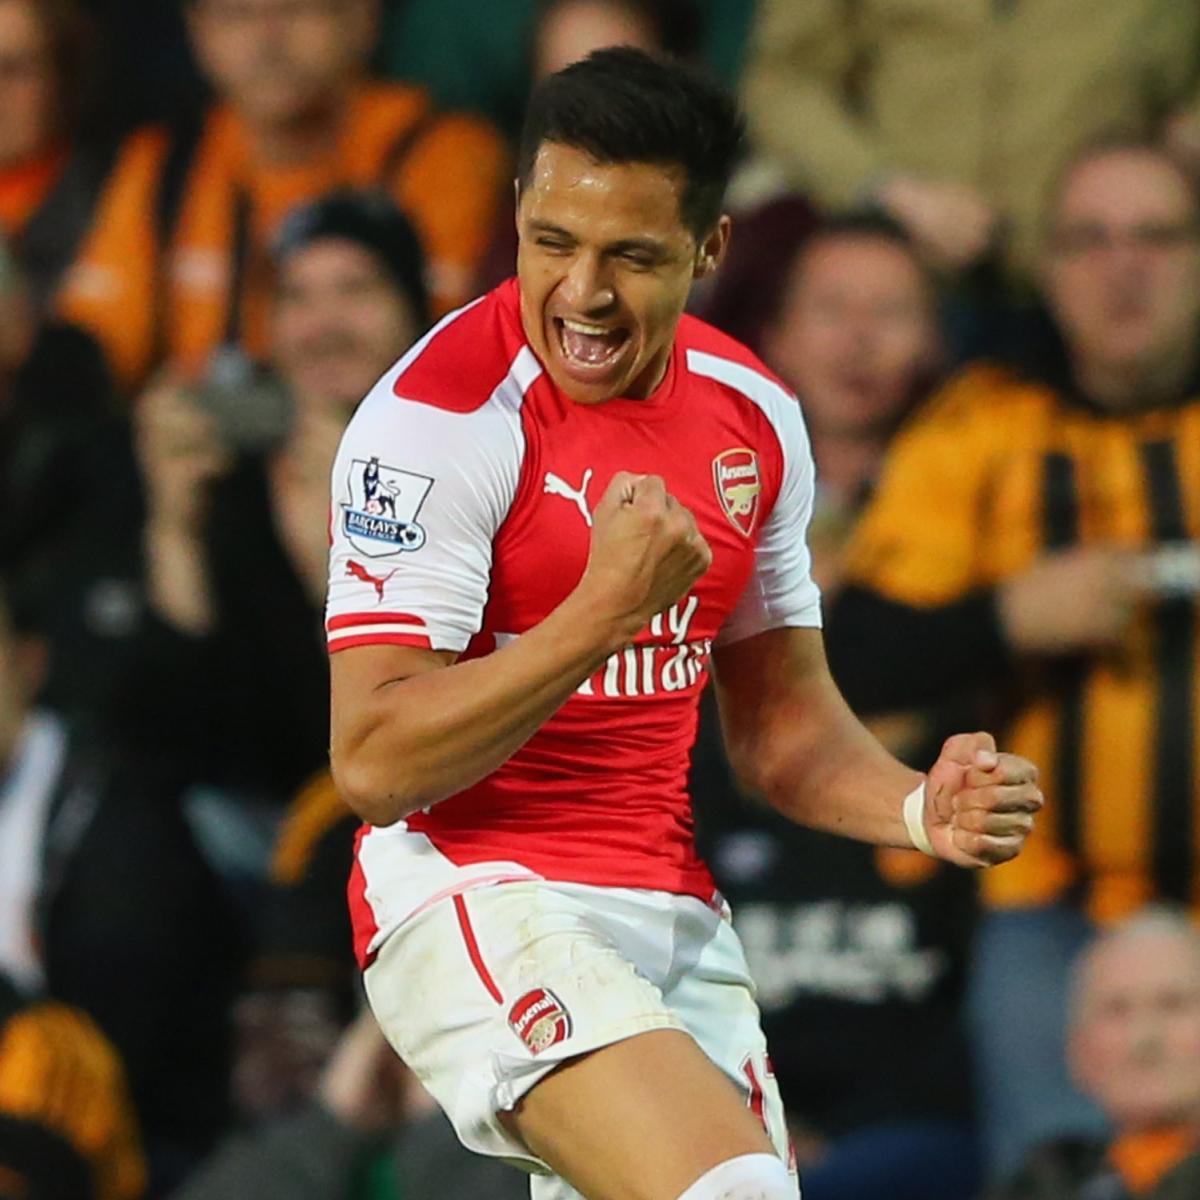 Arsenal Vs Barcelona Live Score Highlights From: Arsenal Vs. Swansea: Live Score, Highlights From Premier